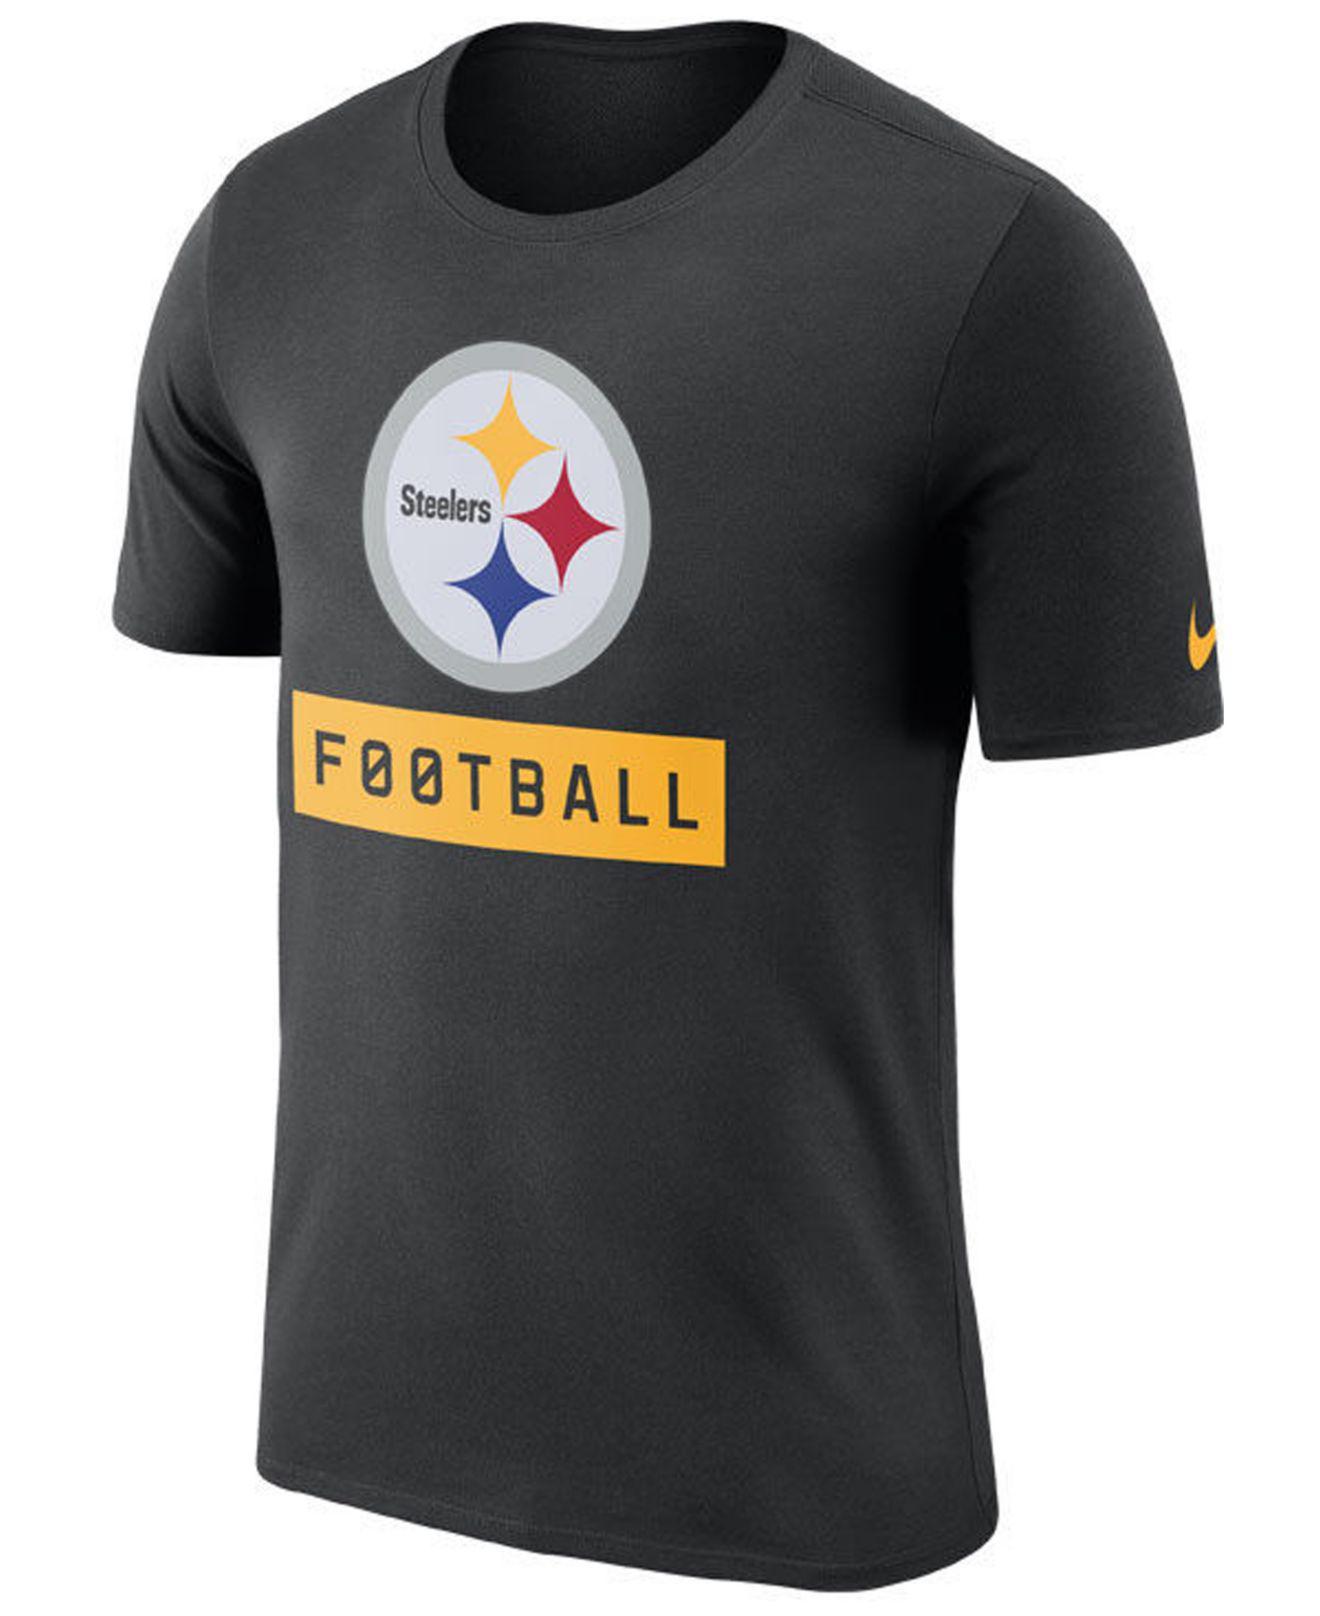 d4f4421cffad Lyst - Nike Pittsburgh Steelers Legend Football Equipment T-shirt in ...